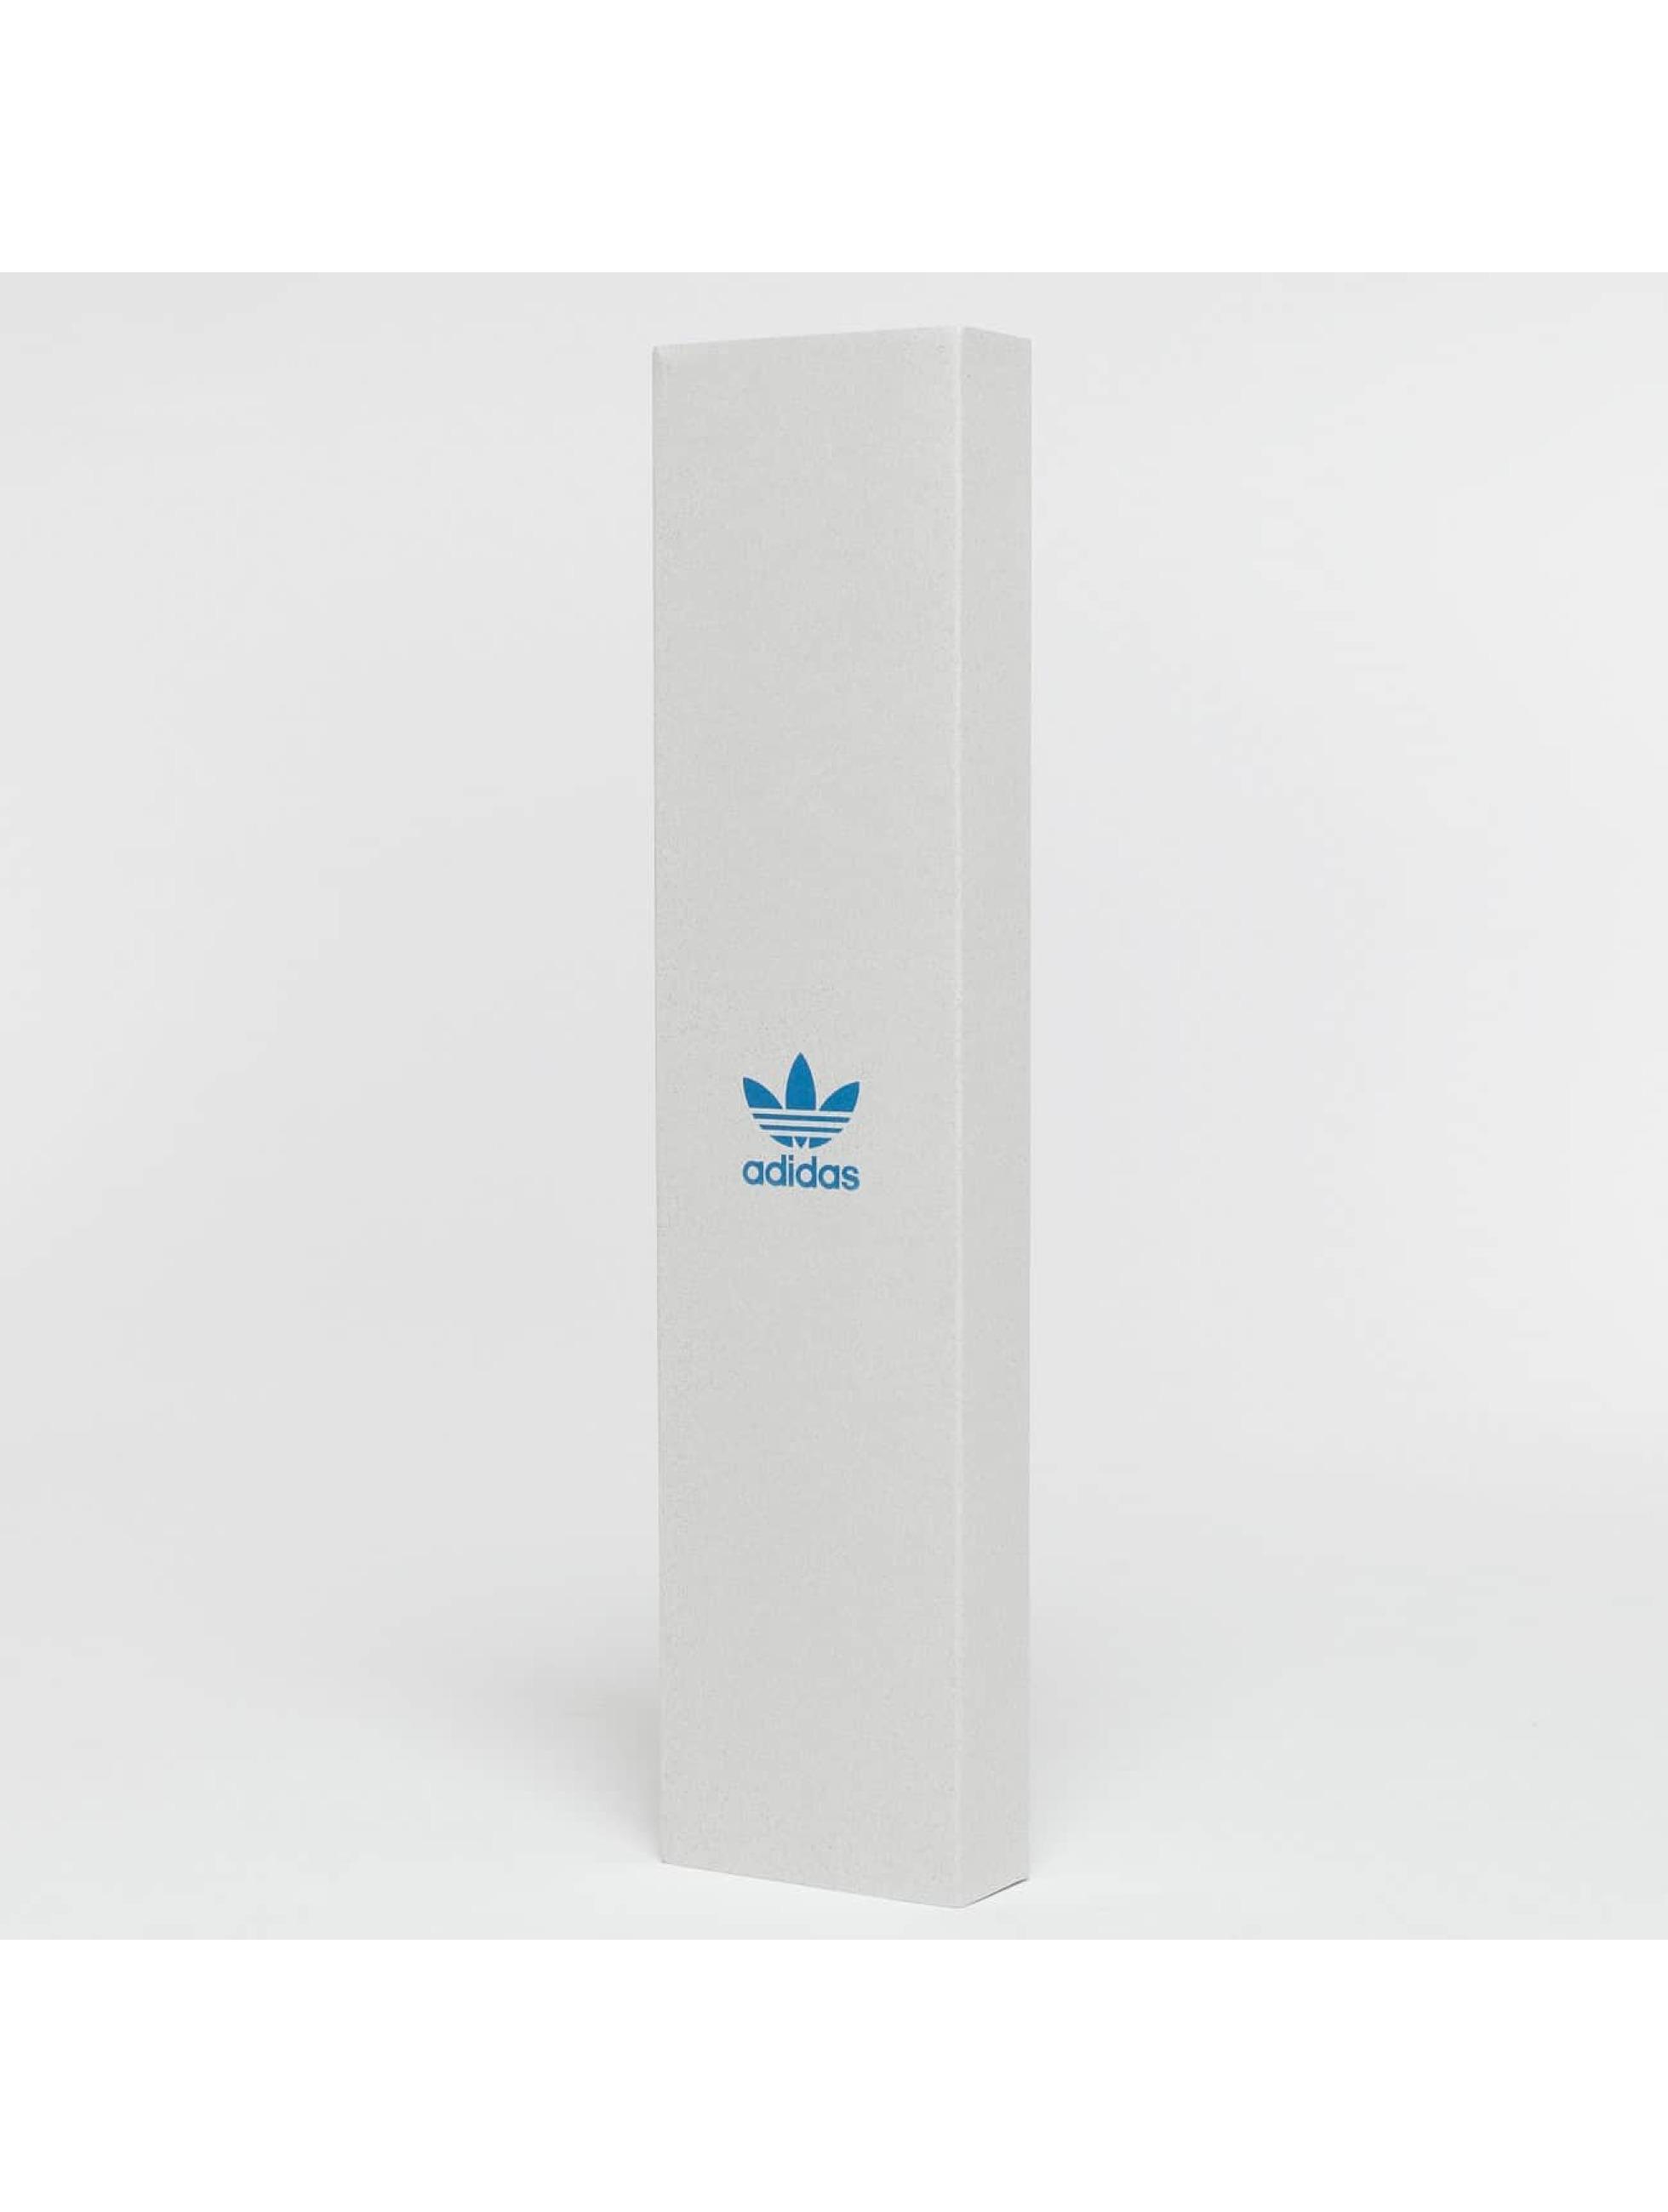 Adidas Watches horloge District L1 zilver